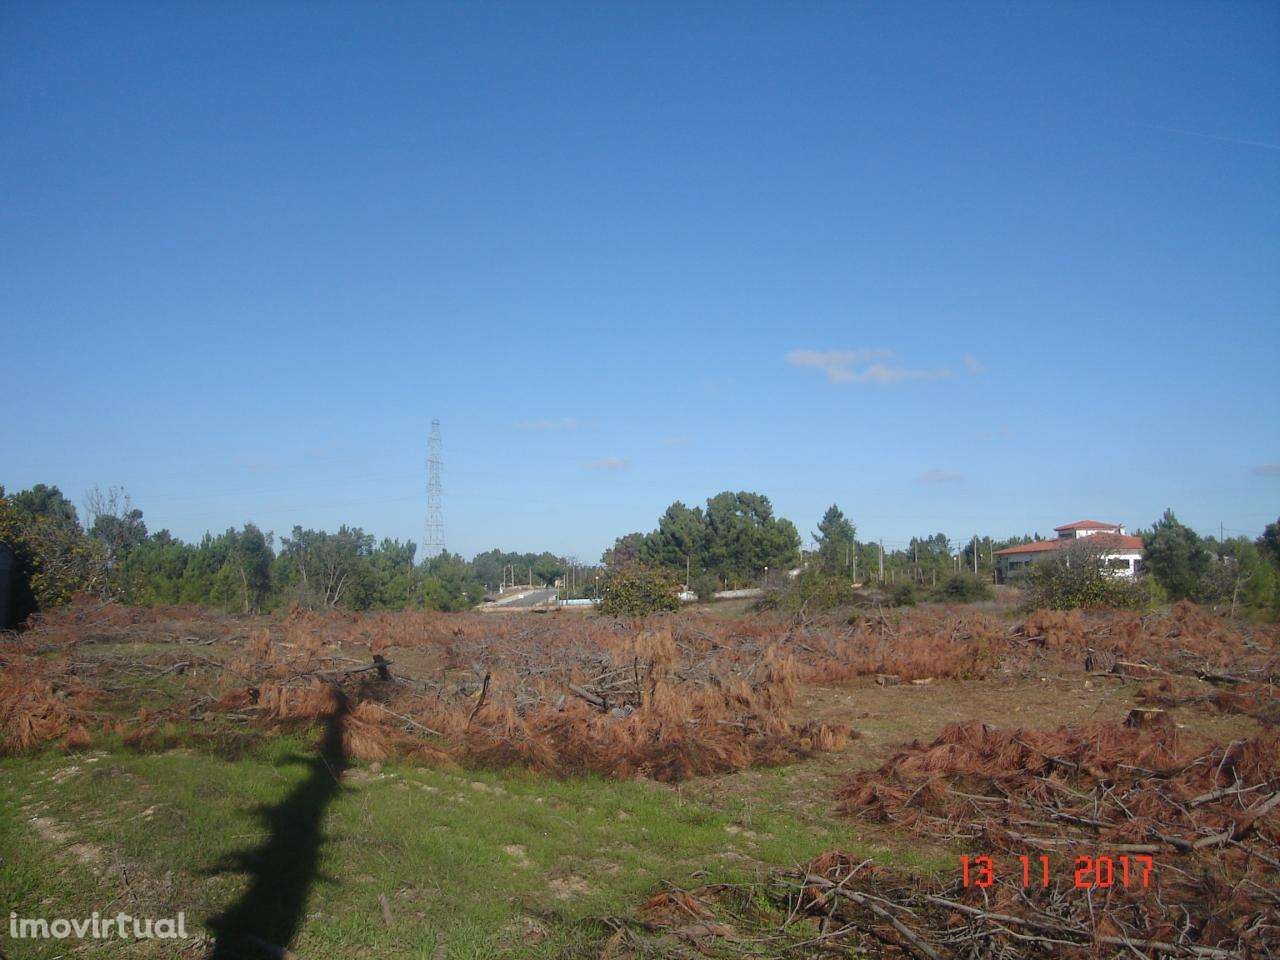 Terreno para comprar, Quinta do Anjo, Palmela, Setúbal - Foto 5